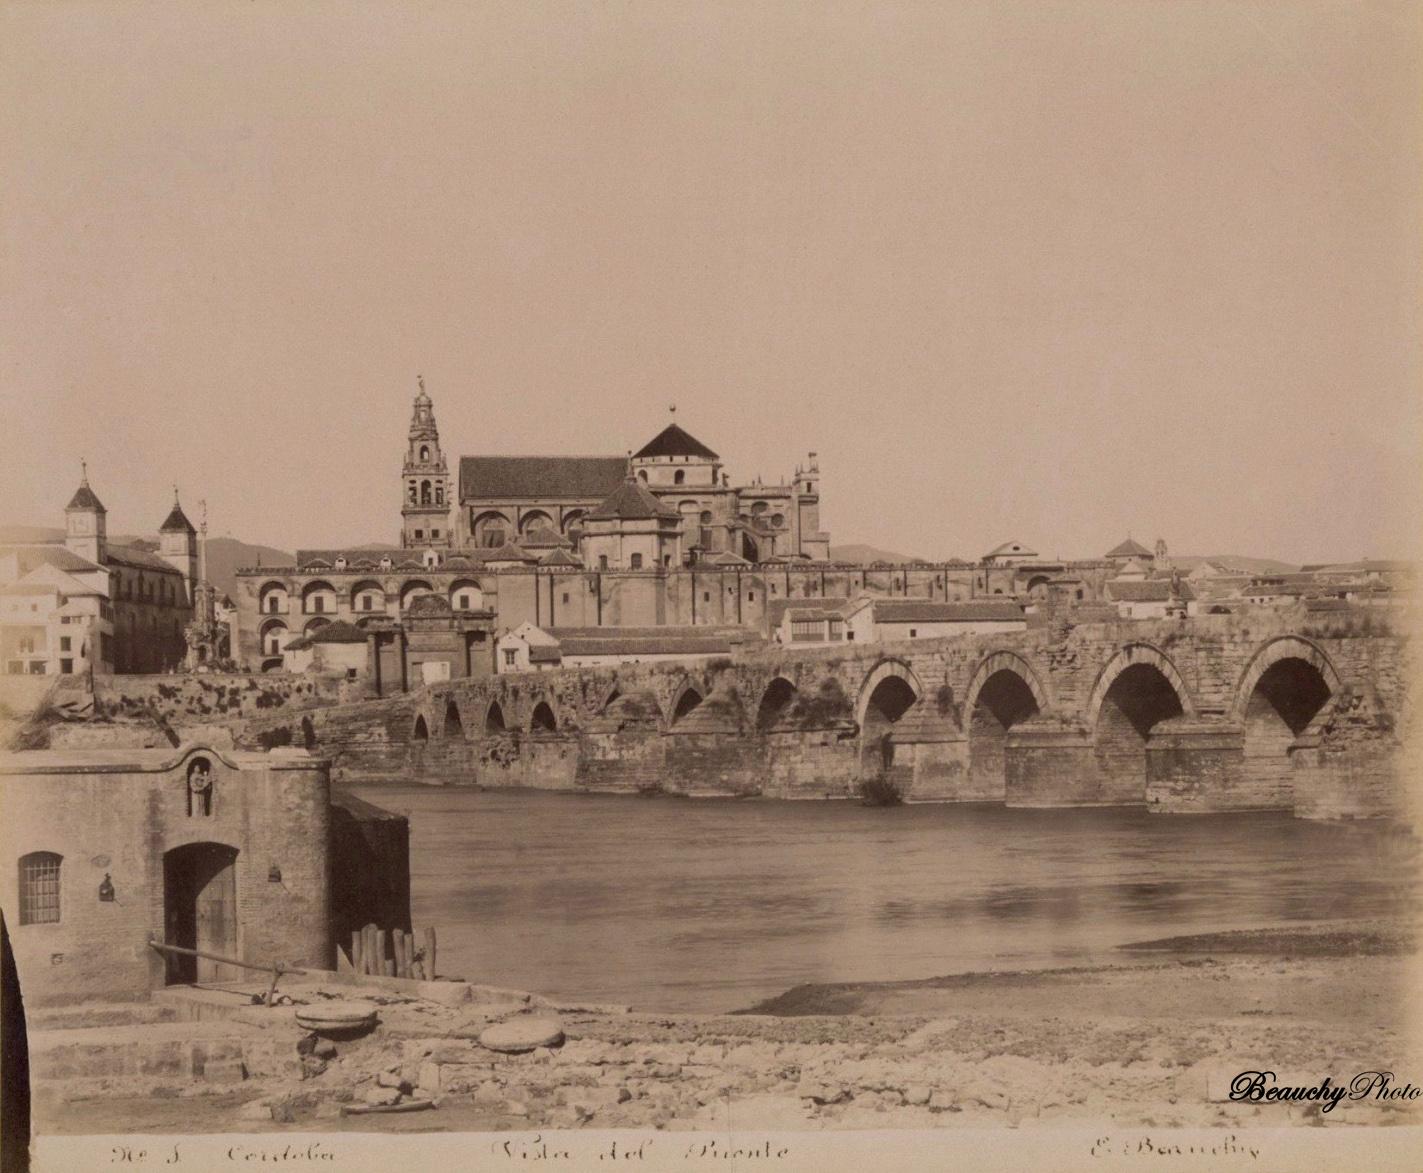 Beauchyphoto_Córdoba-Vista_del_Puente_02_c.1880_Emilio_Beauchy_Cano_fotografias_antiguas_postales_vistas_y_monumentos